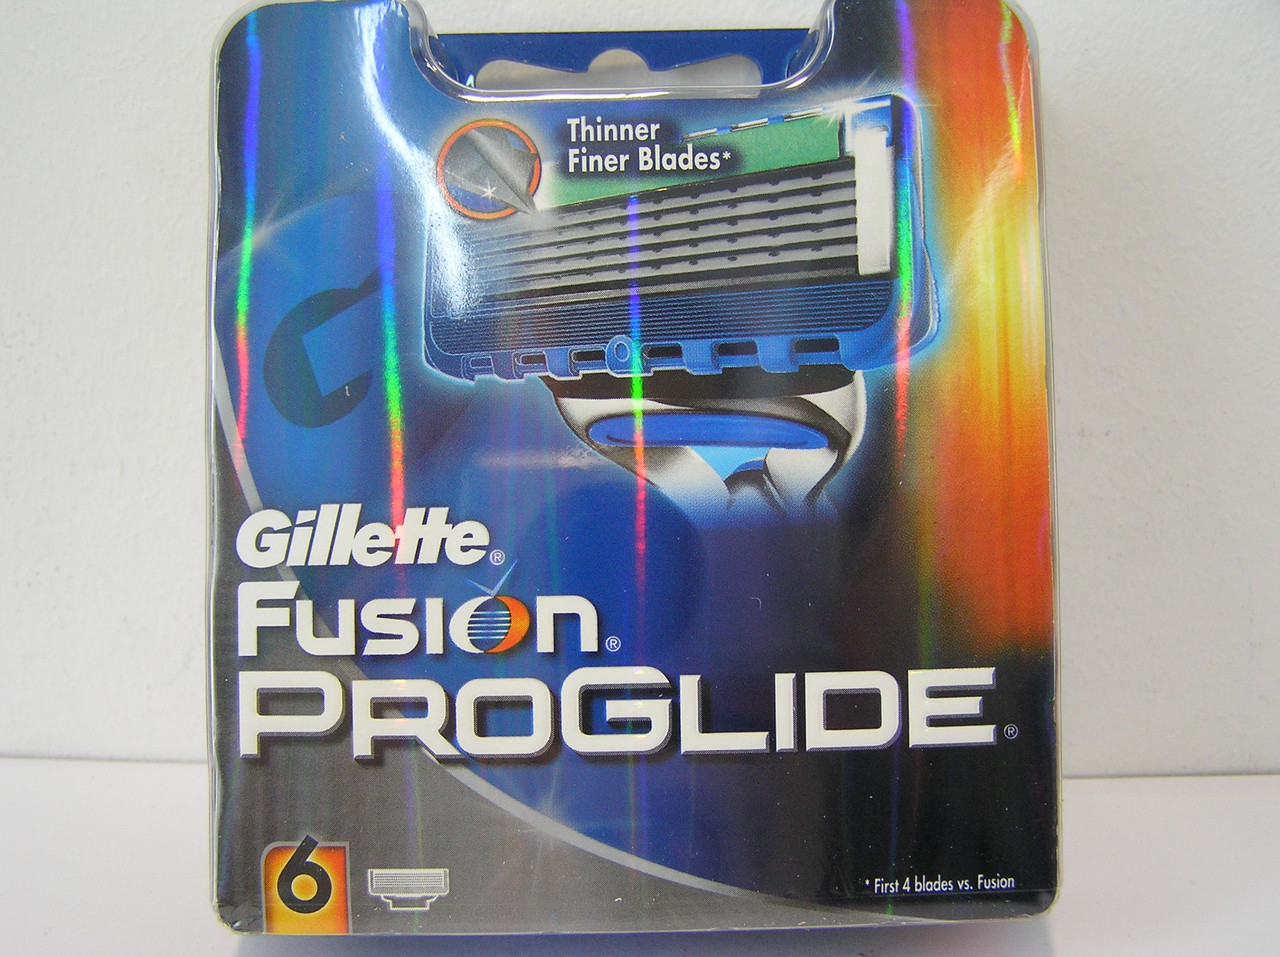 Кассеты Gillette Fusion Proglide 6 шт. ( Картриджи лезвия жиллетт Фюжин проглейд Оригинал )